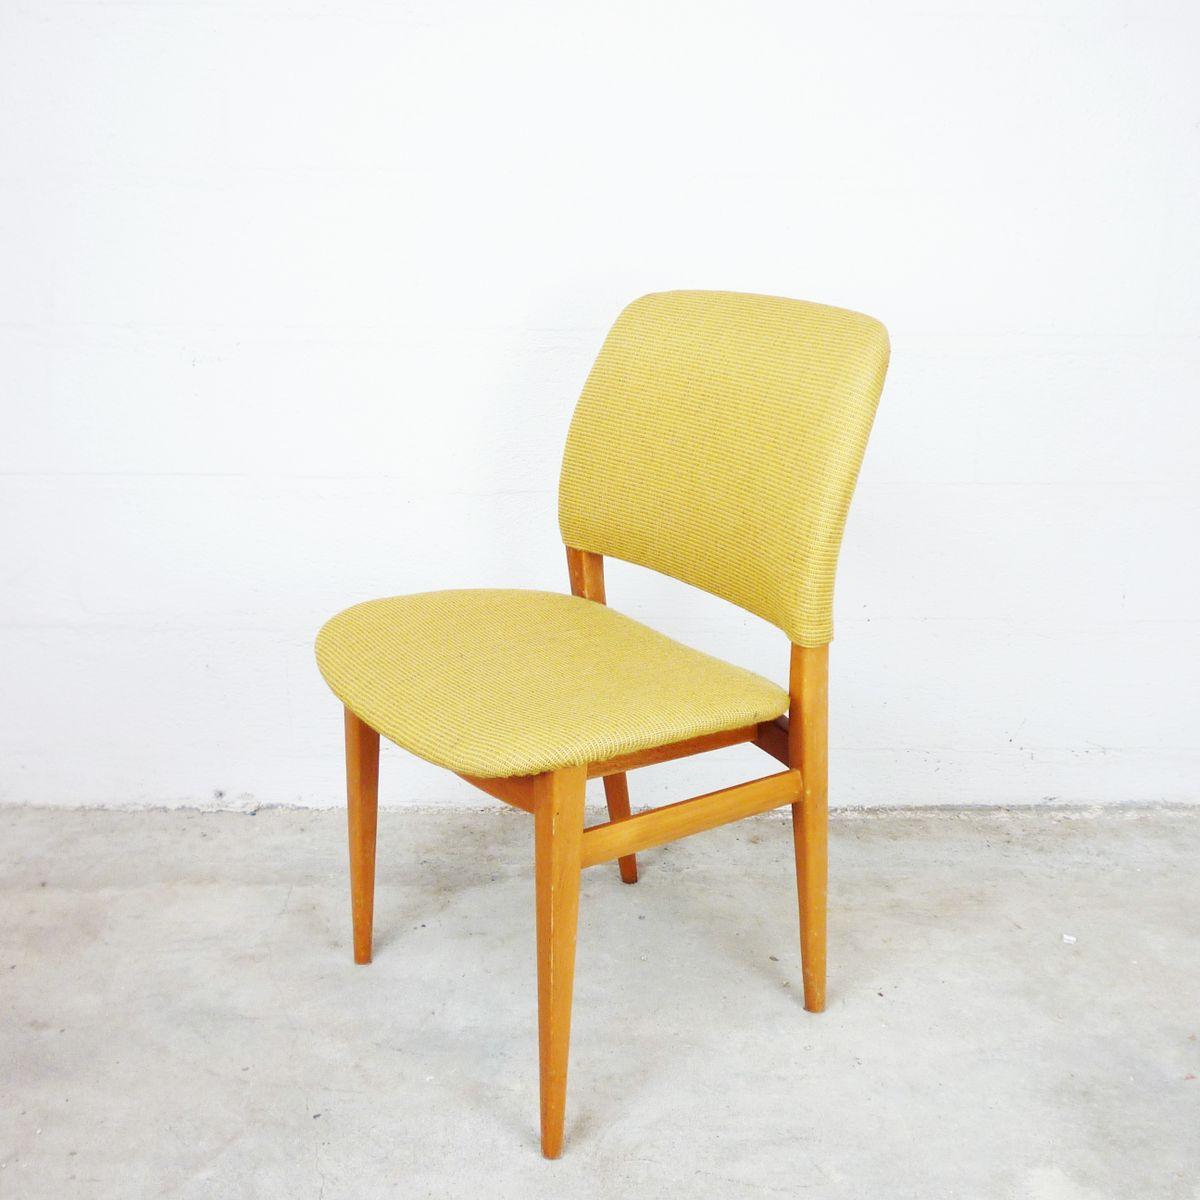 skandinavische mid century st hle 6er set bei pamono kaufen. Black Bedroom Furniture Sets. Home Design Ideas